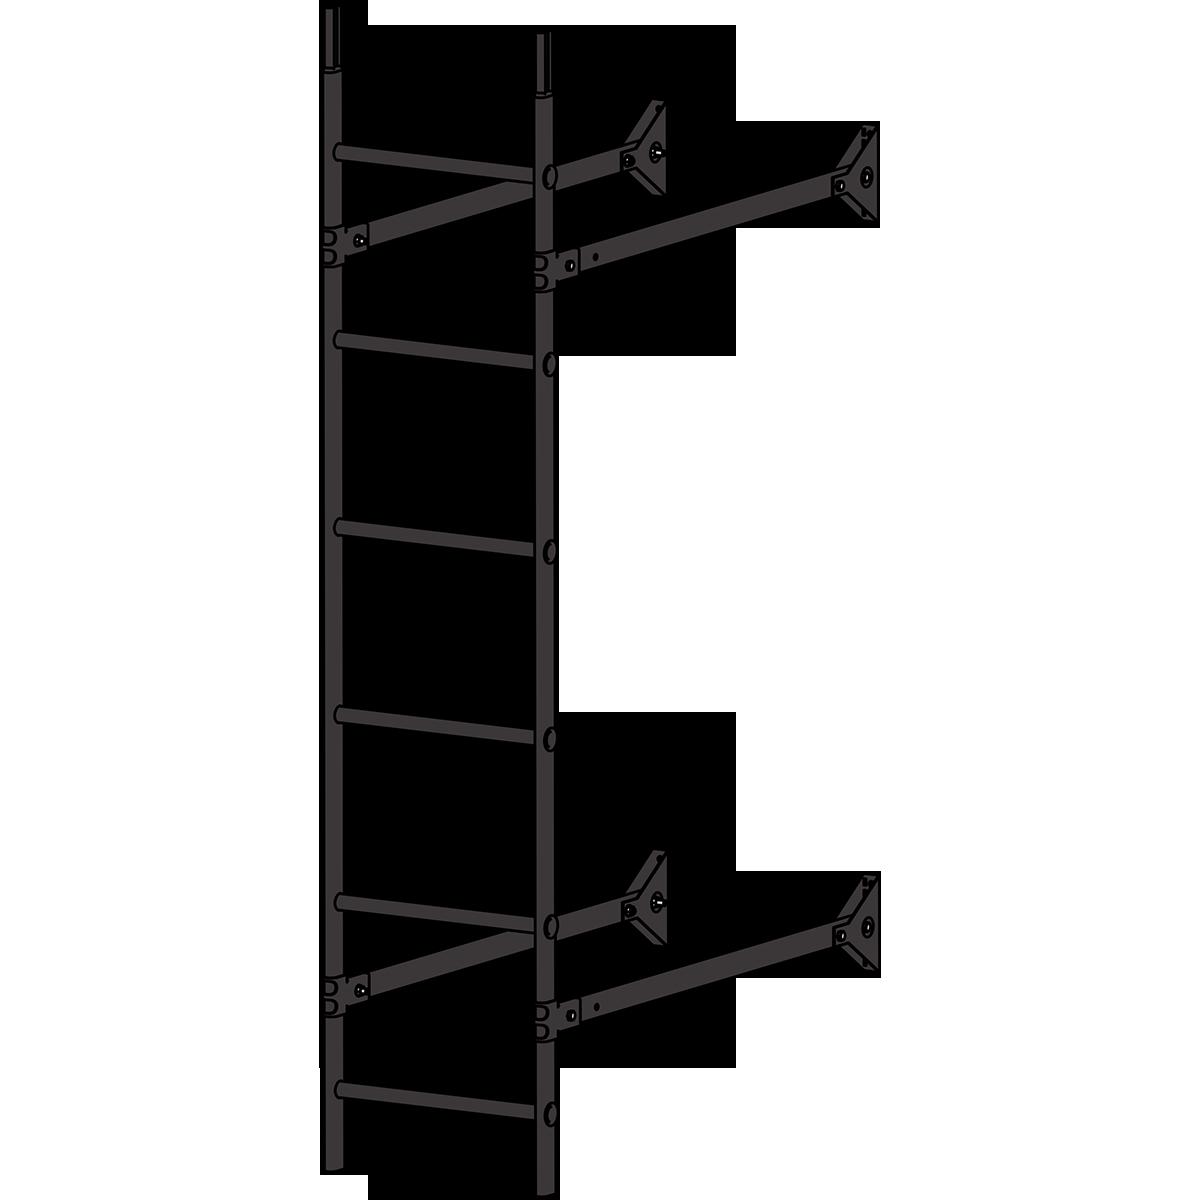 Лестница стеновая ROOFSYSTEMS ELITE 400 1,8 м RAL 8019 Серо-коричневый